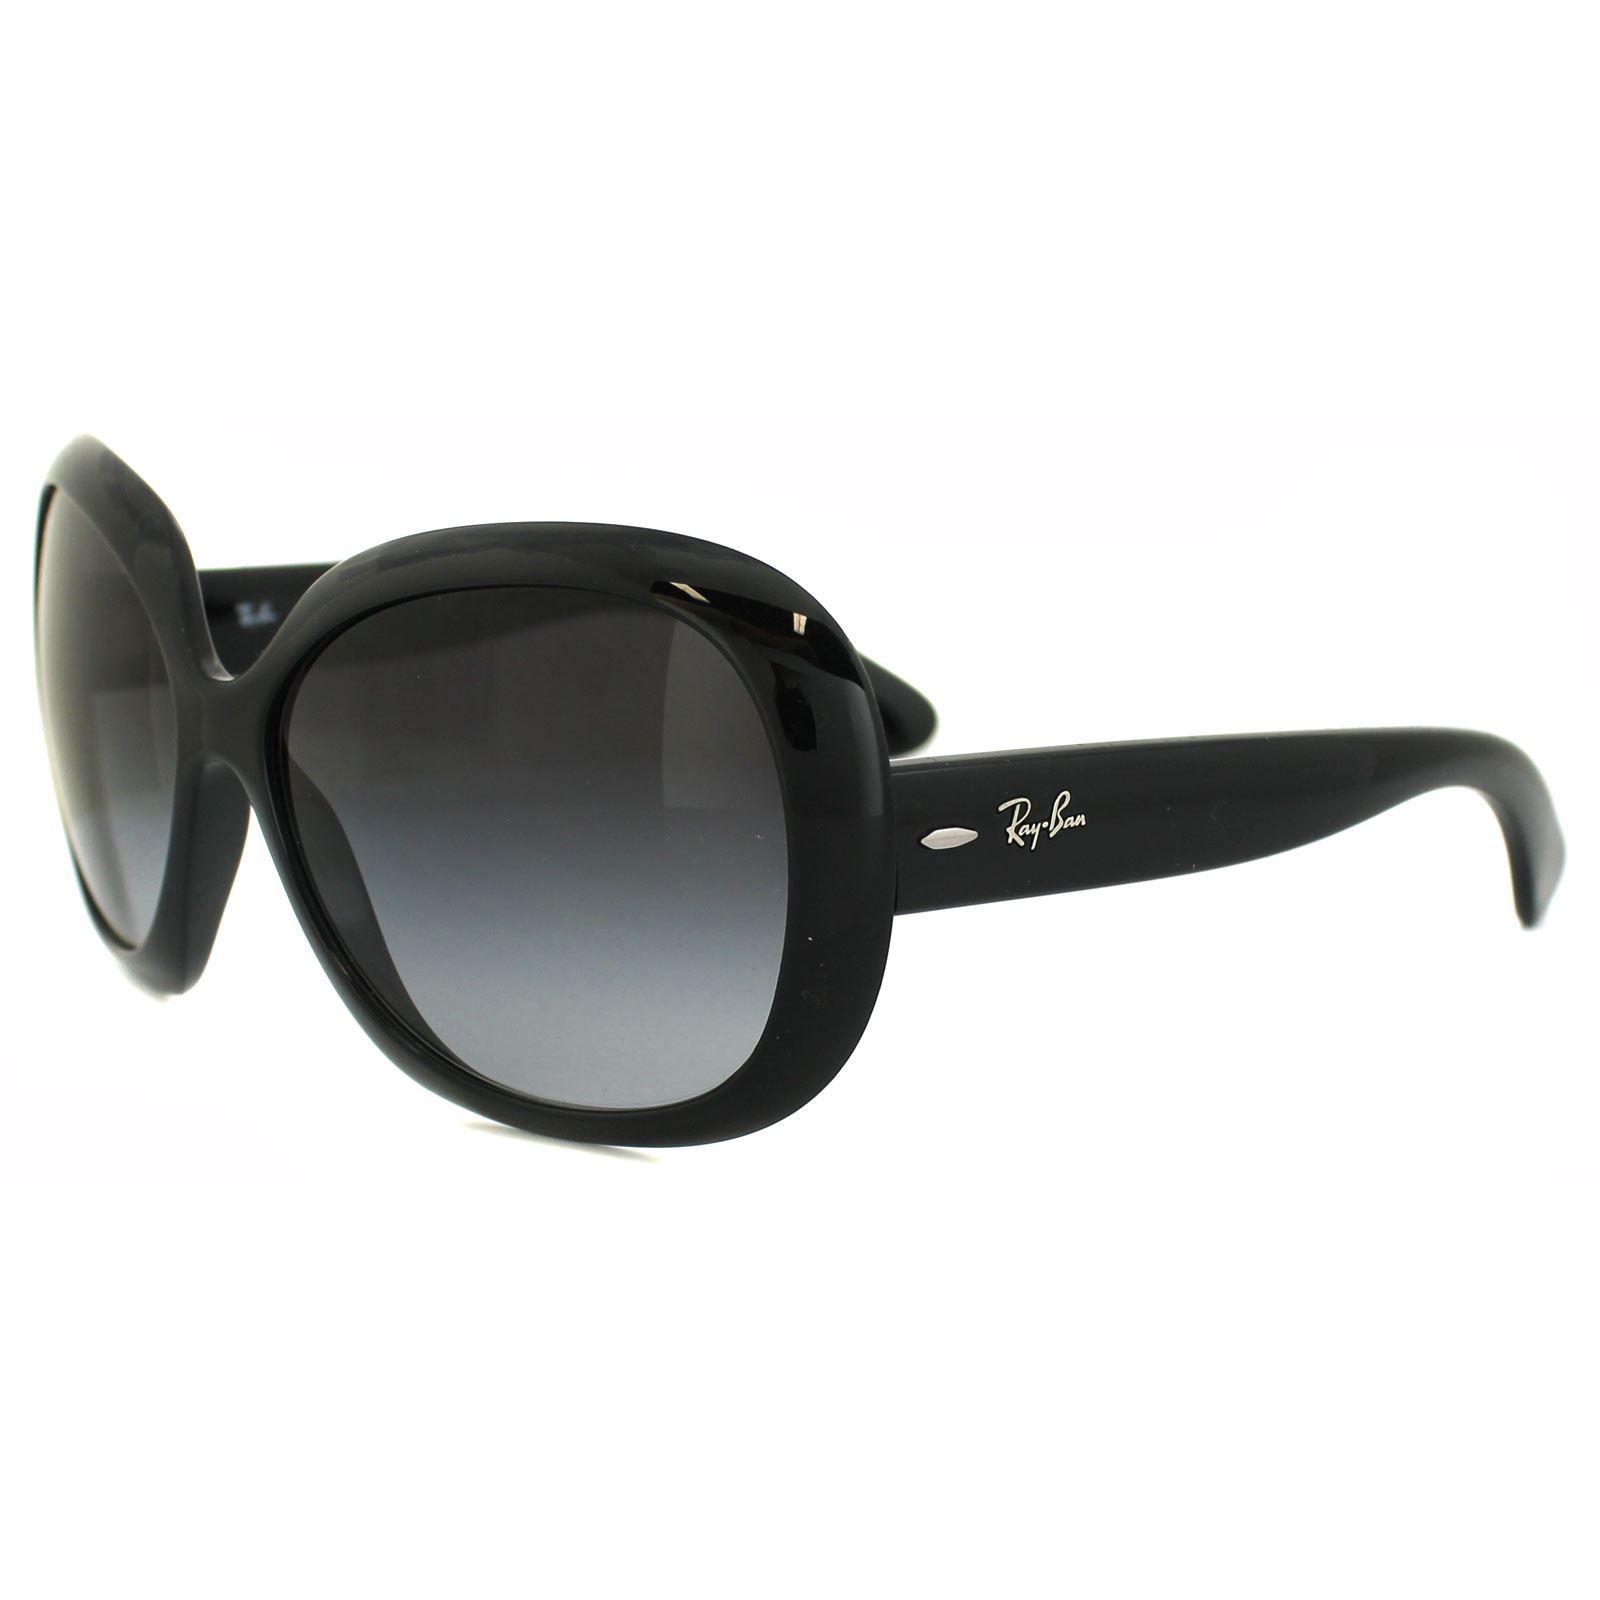 Ray-Ban Sunglasses Jackie Ohh Ii 4098 Black Grey Gradient 601/8G